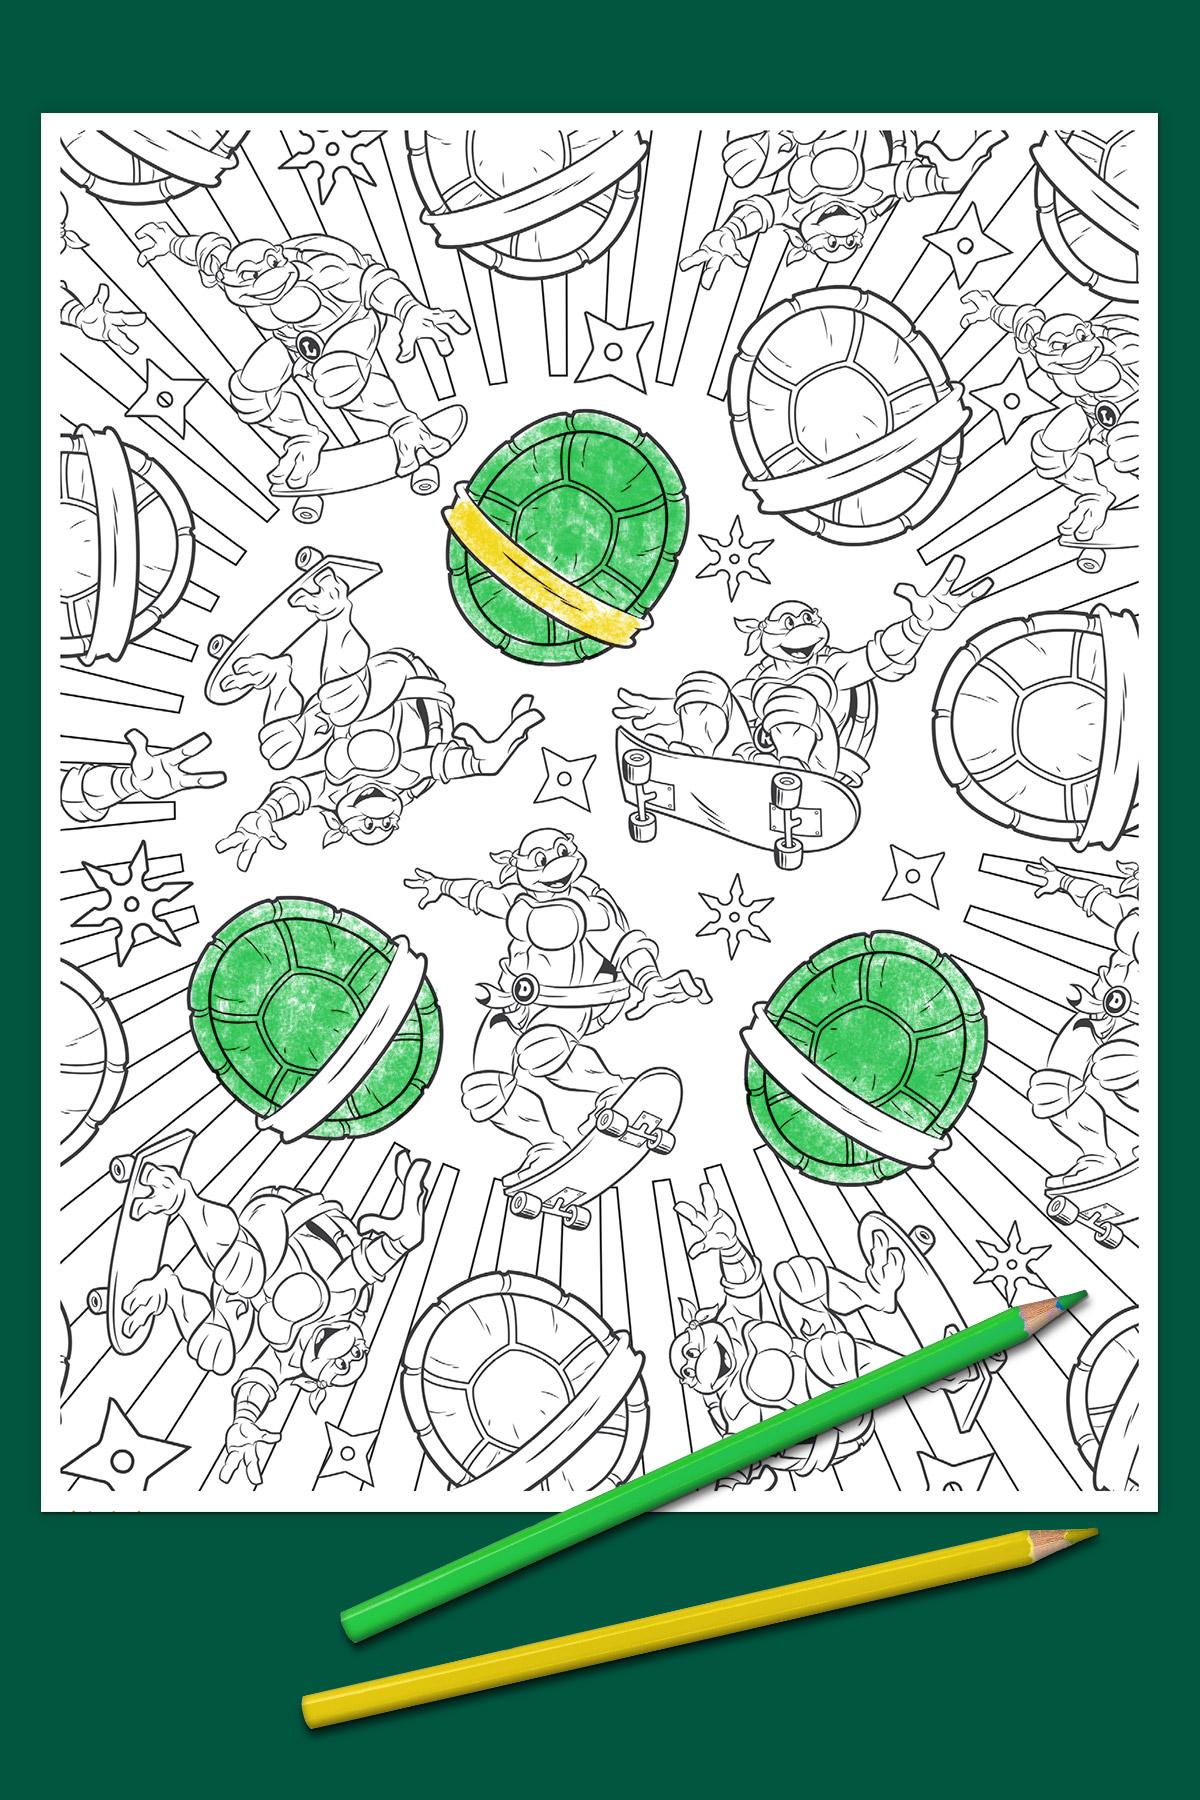 Ninja-Turtles-Art-Coloring-Page | Turtle coloring pages, Ninja ... | 1800x1200